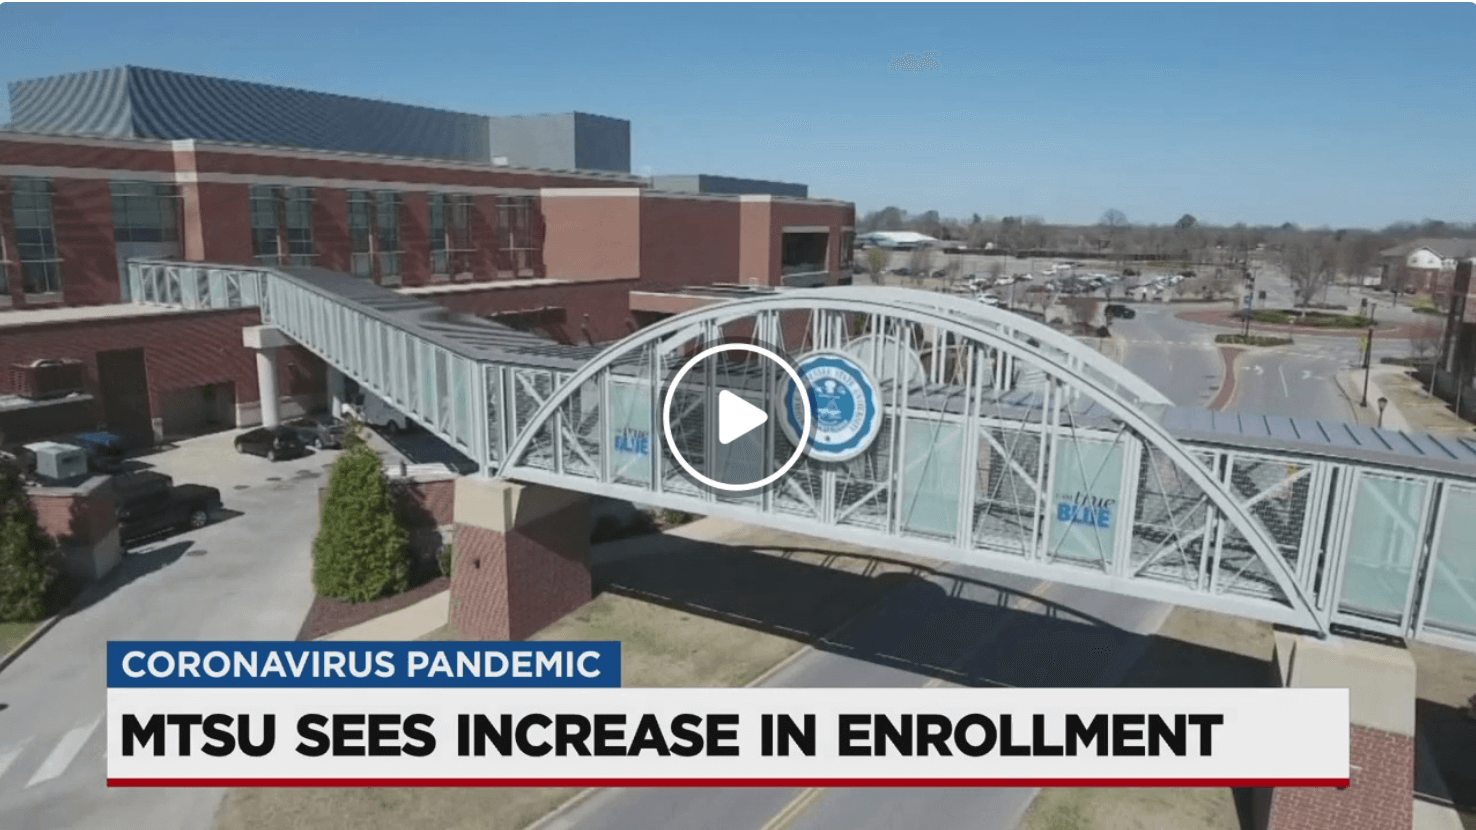 MTSU Sees Increase in Enrollment